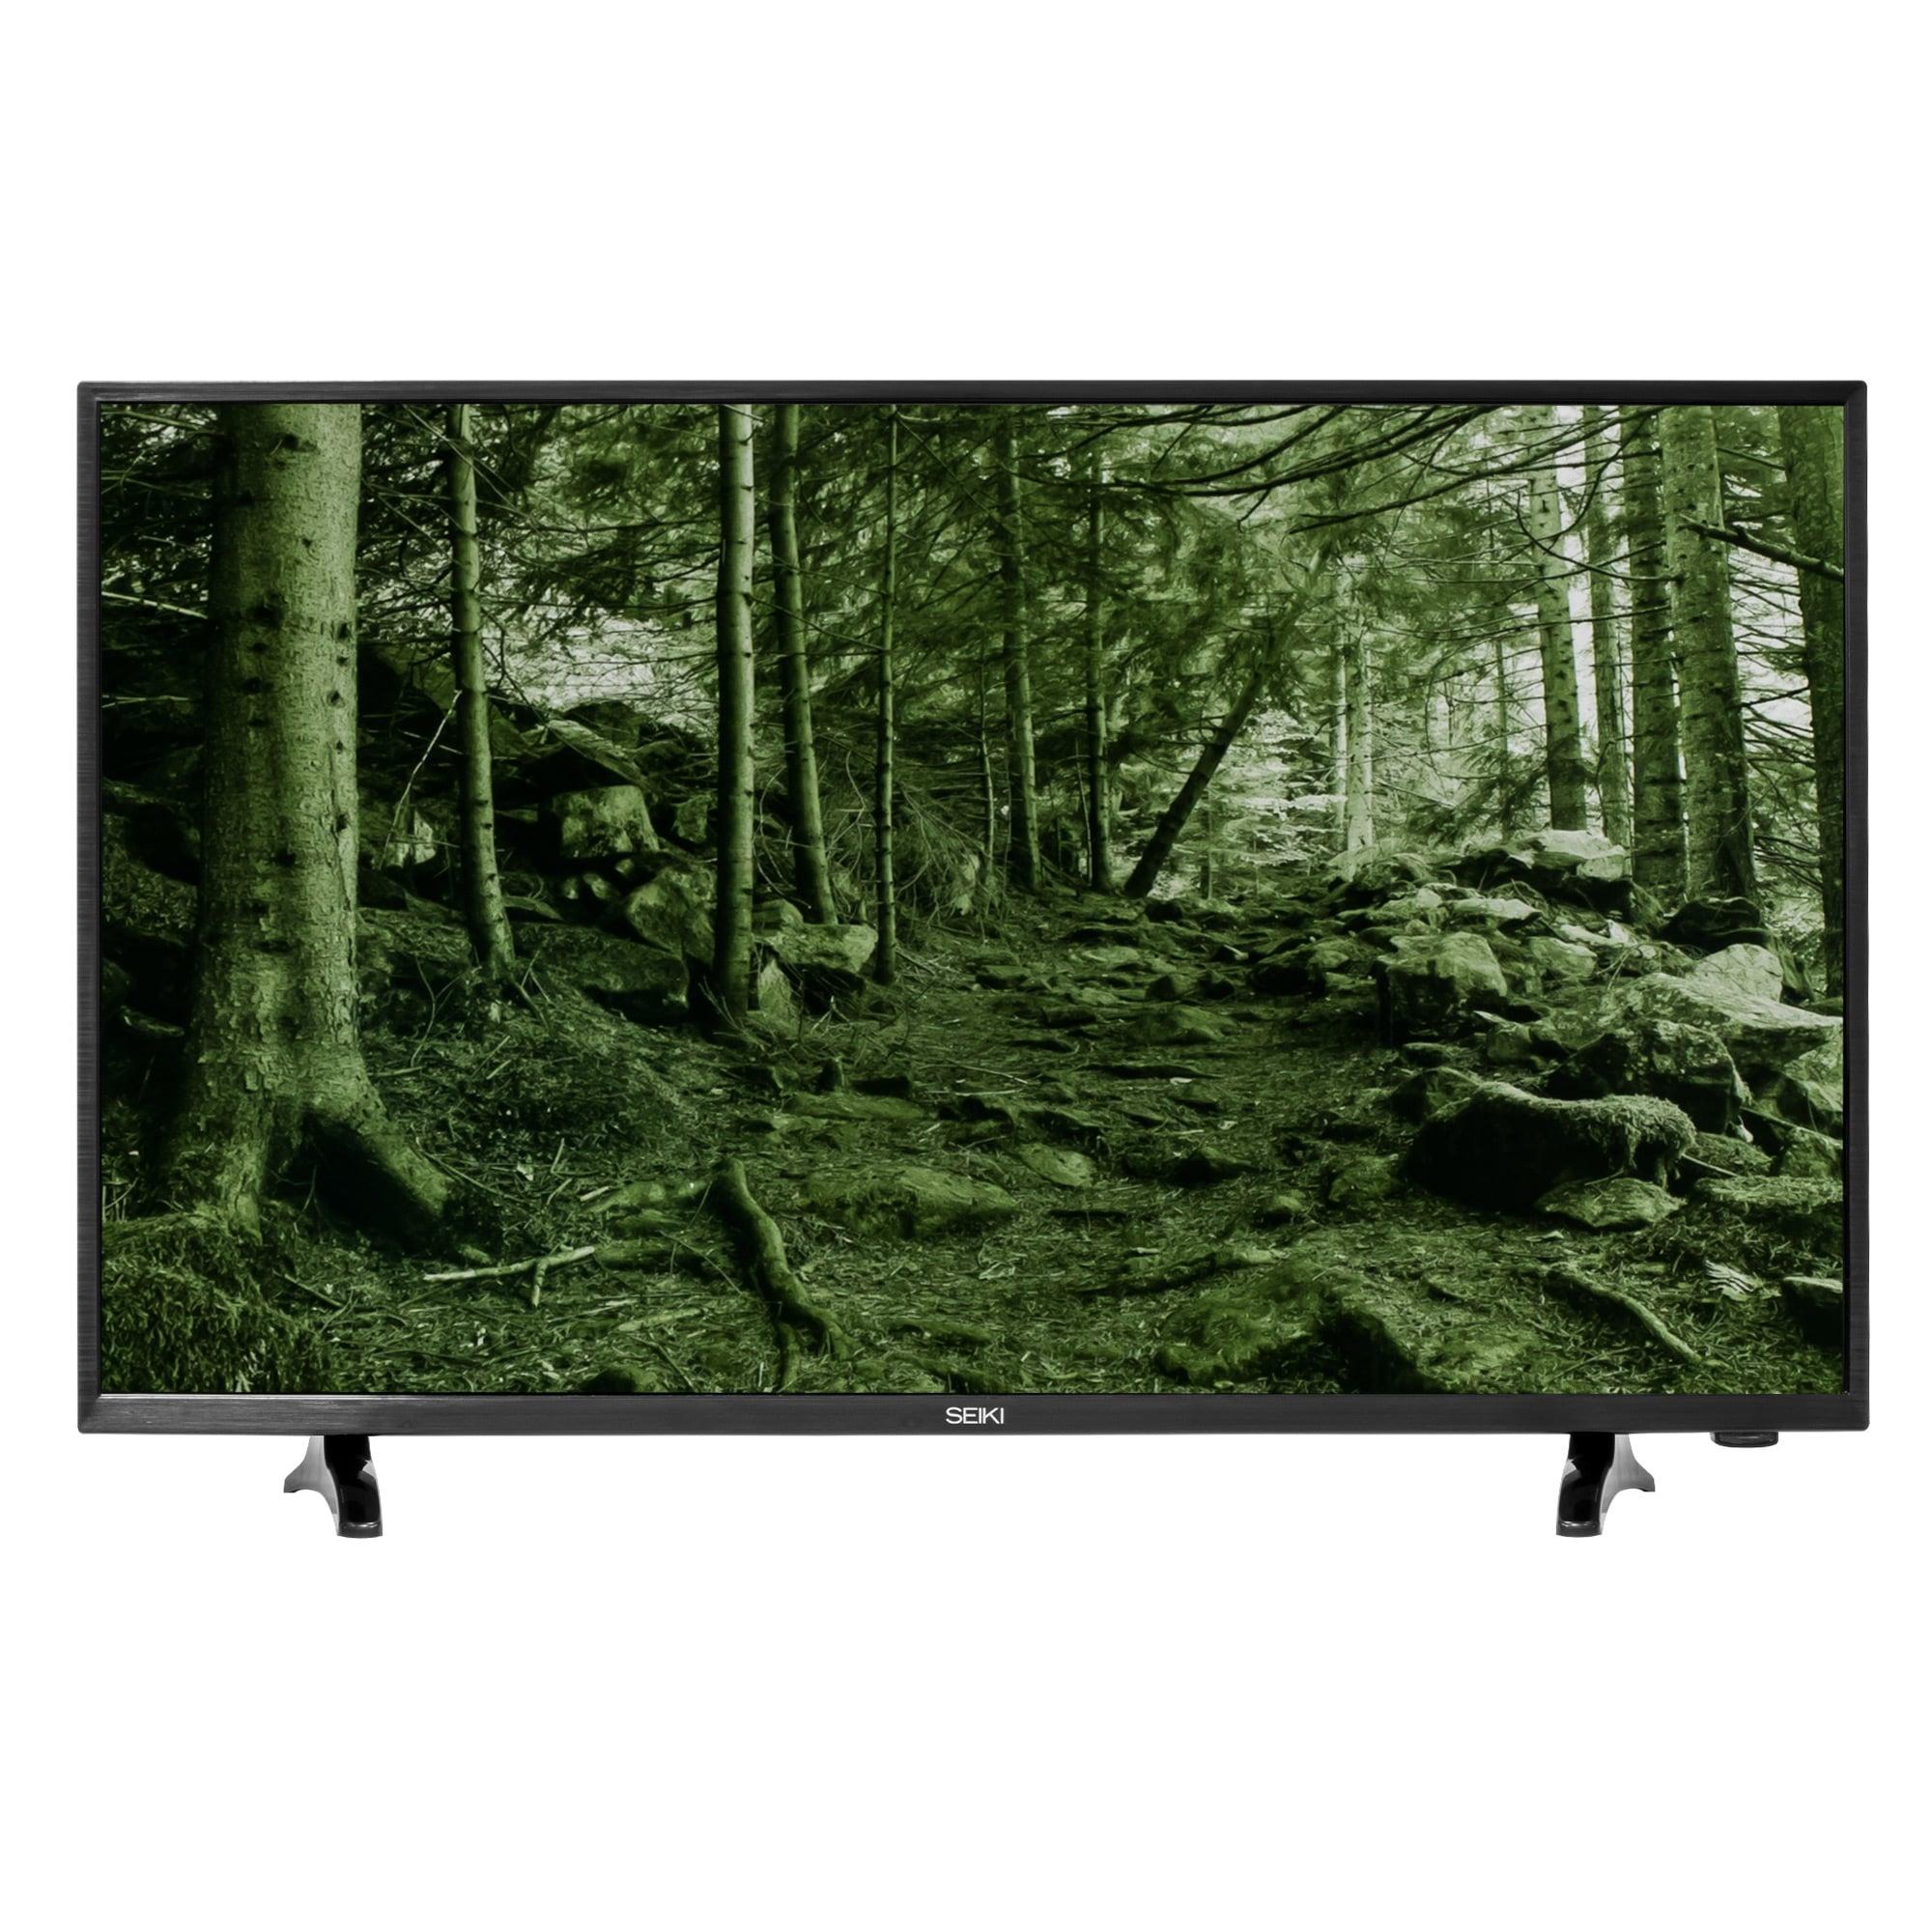 An image of SEIKI SC-40FS703N 40-Inch FHD LED TV